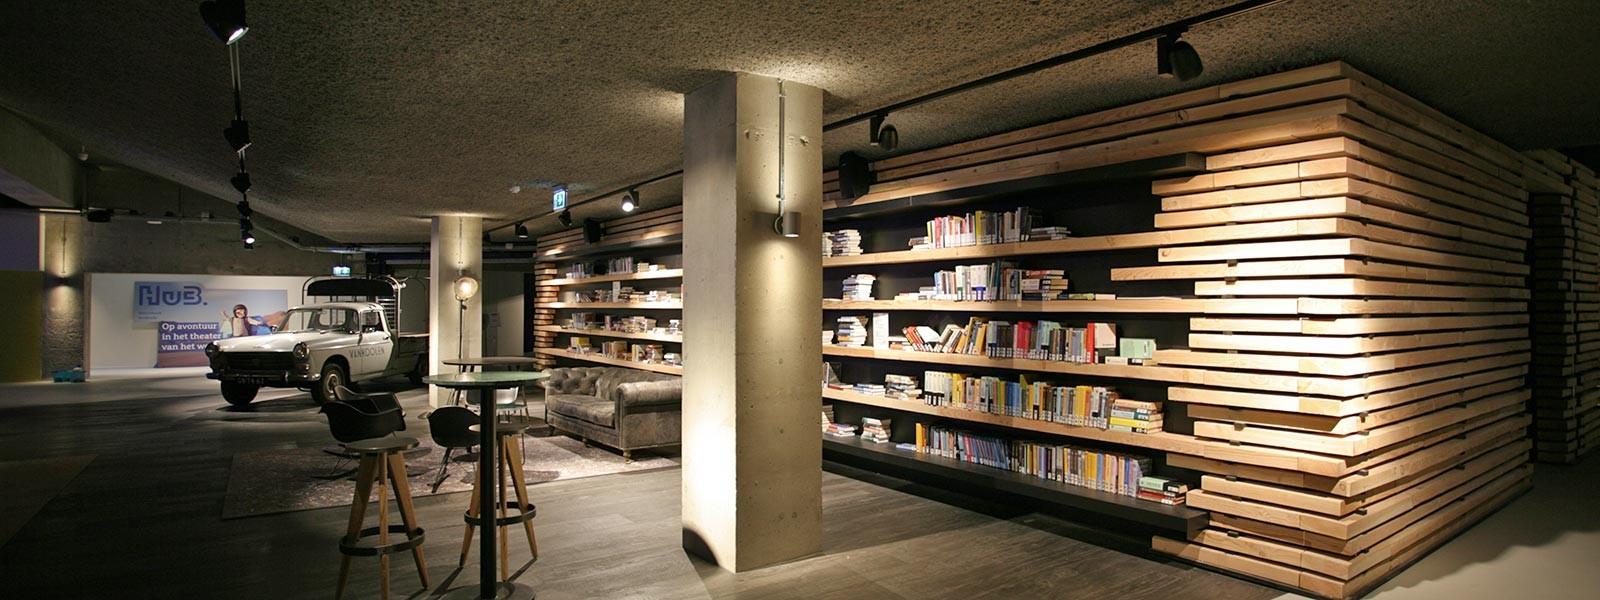 HuB.Bibliotheek, Kerkrade